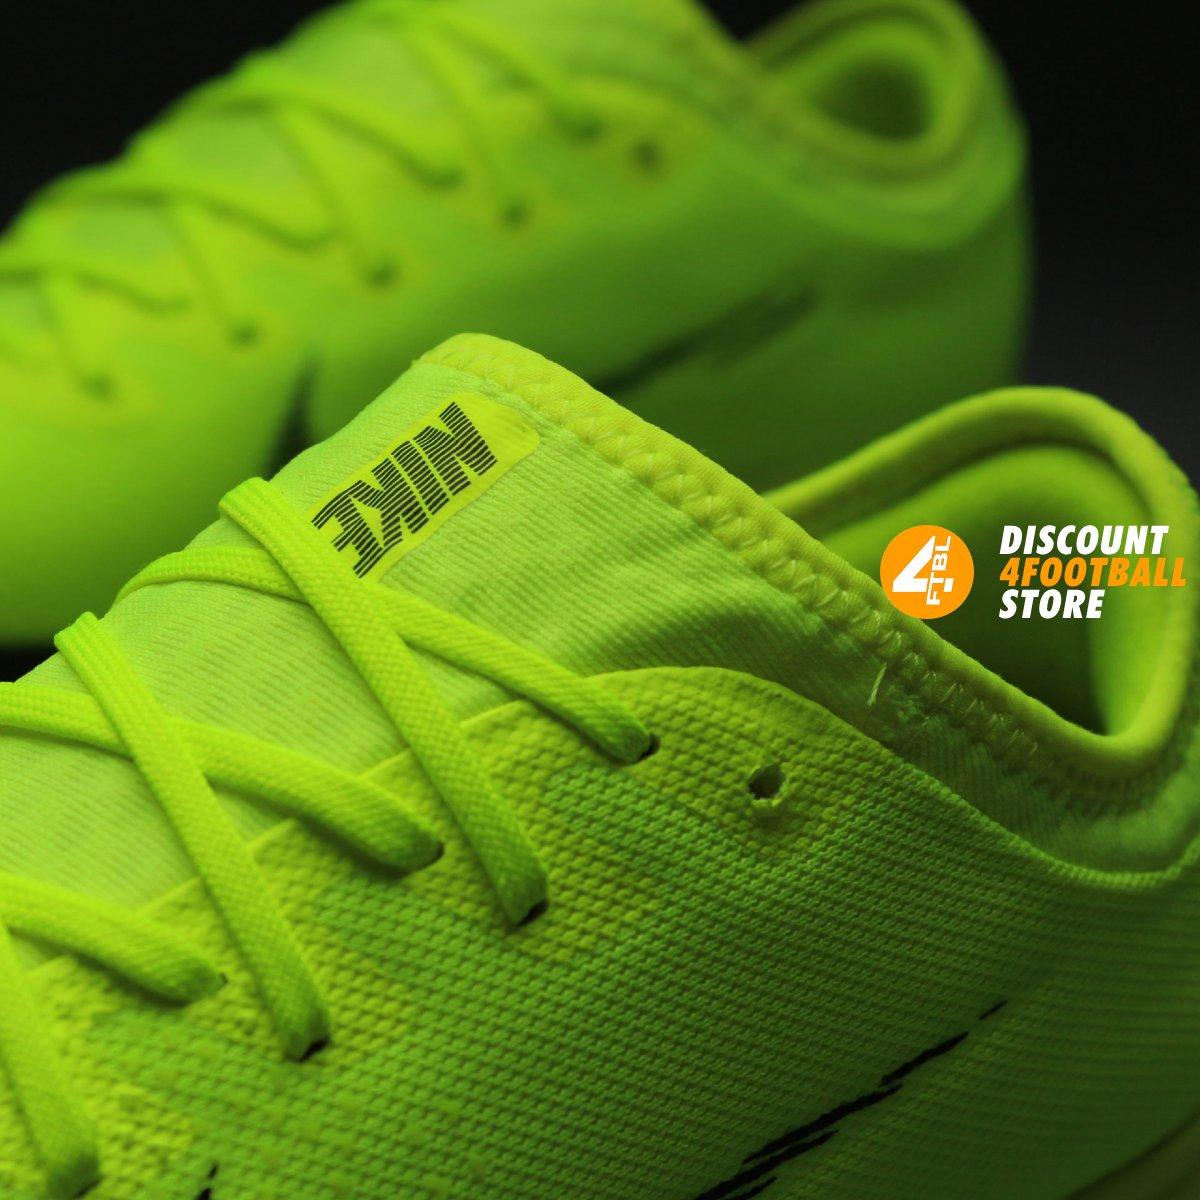 ... Сороконожки Nike Mercurial Vapor 12 Pro AH7388-701 4 ... e768bf074ec06